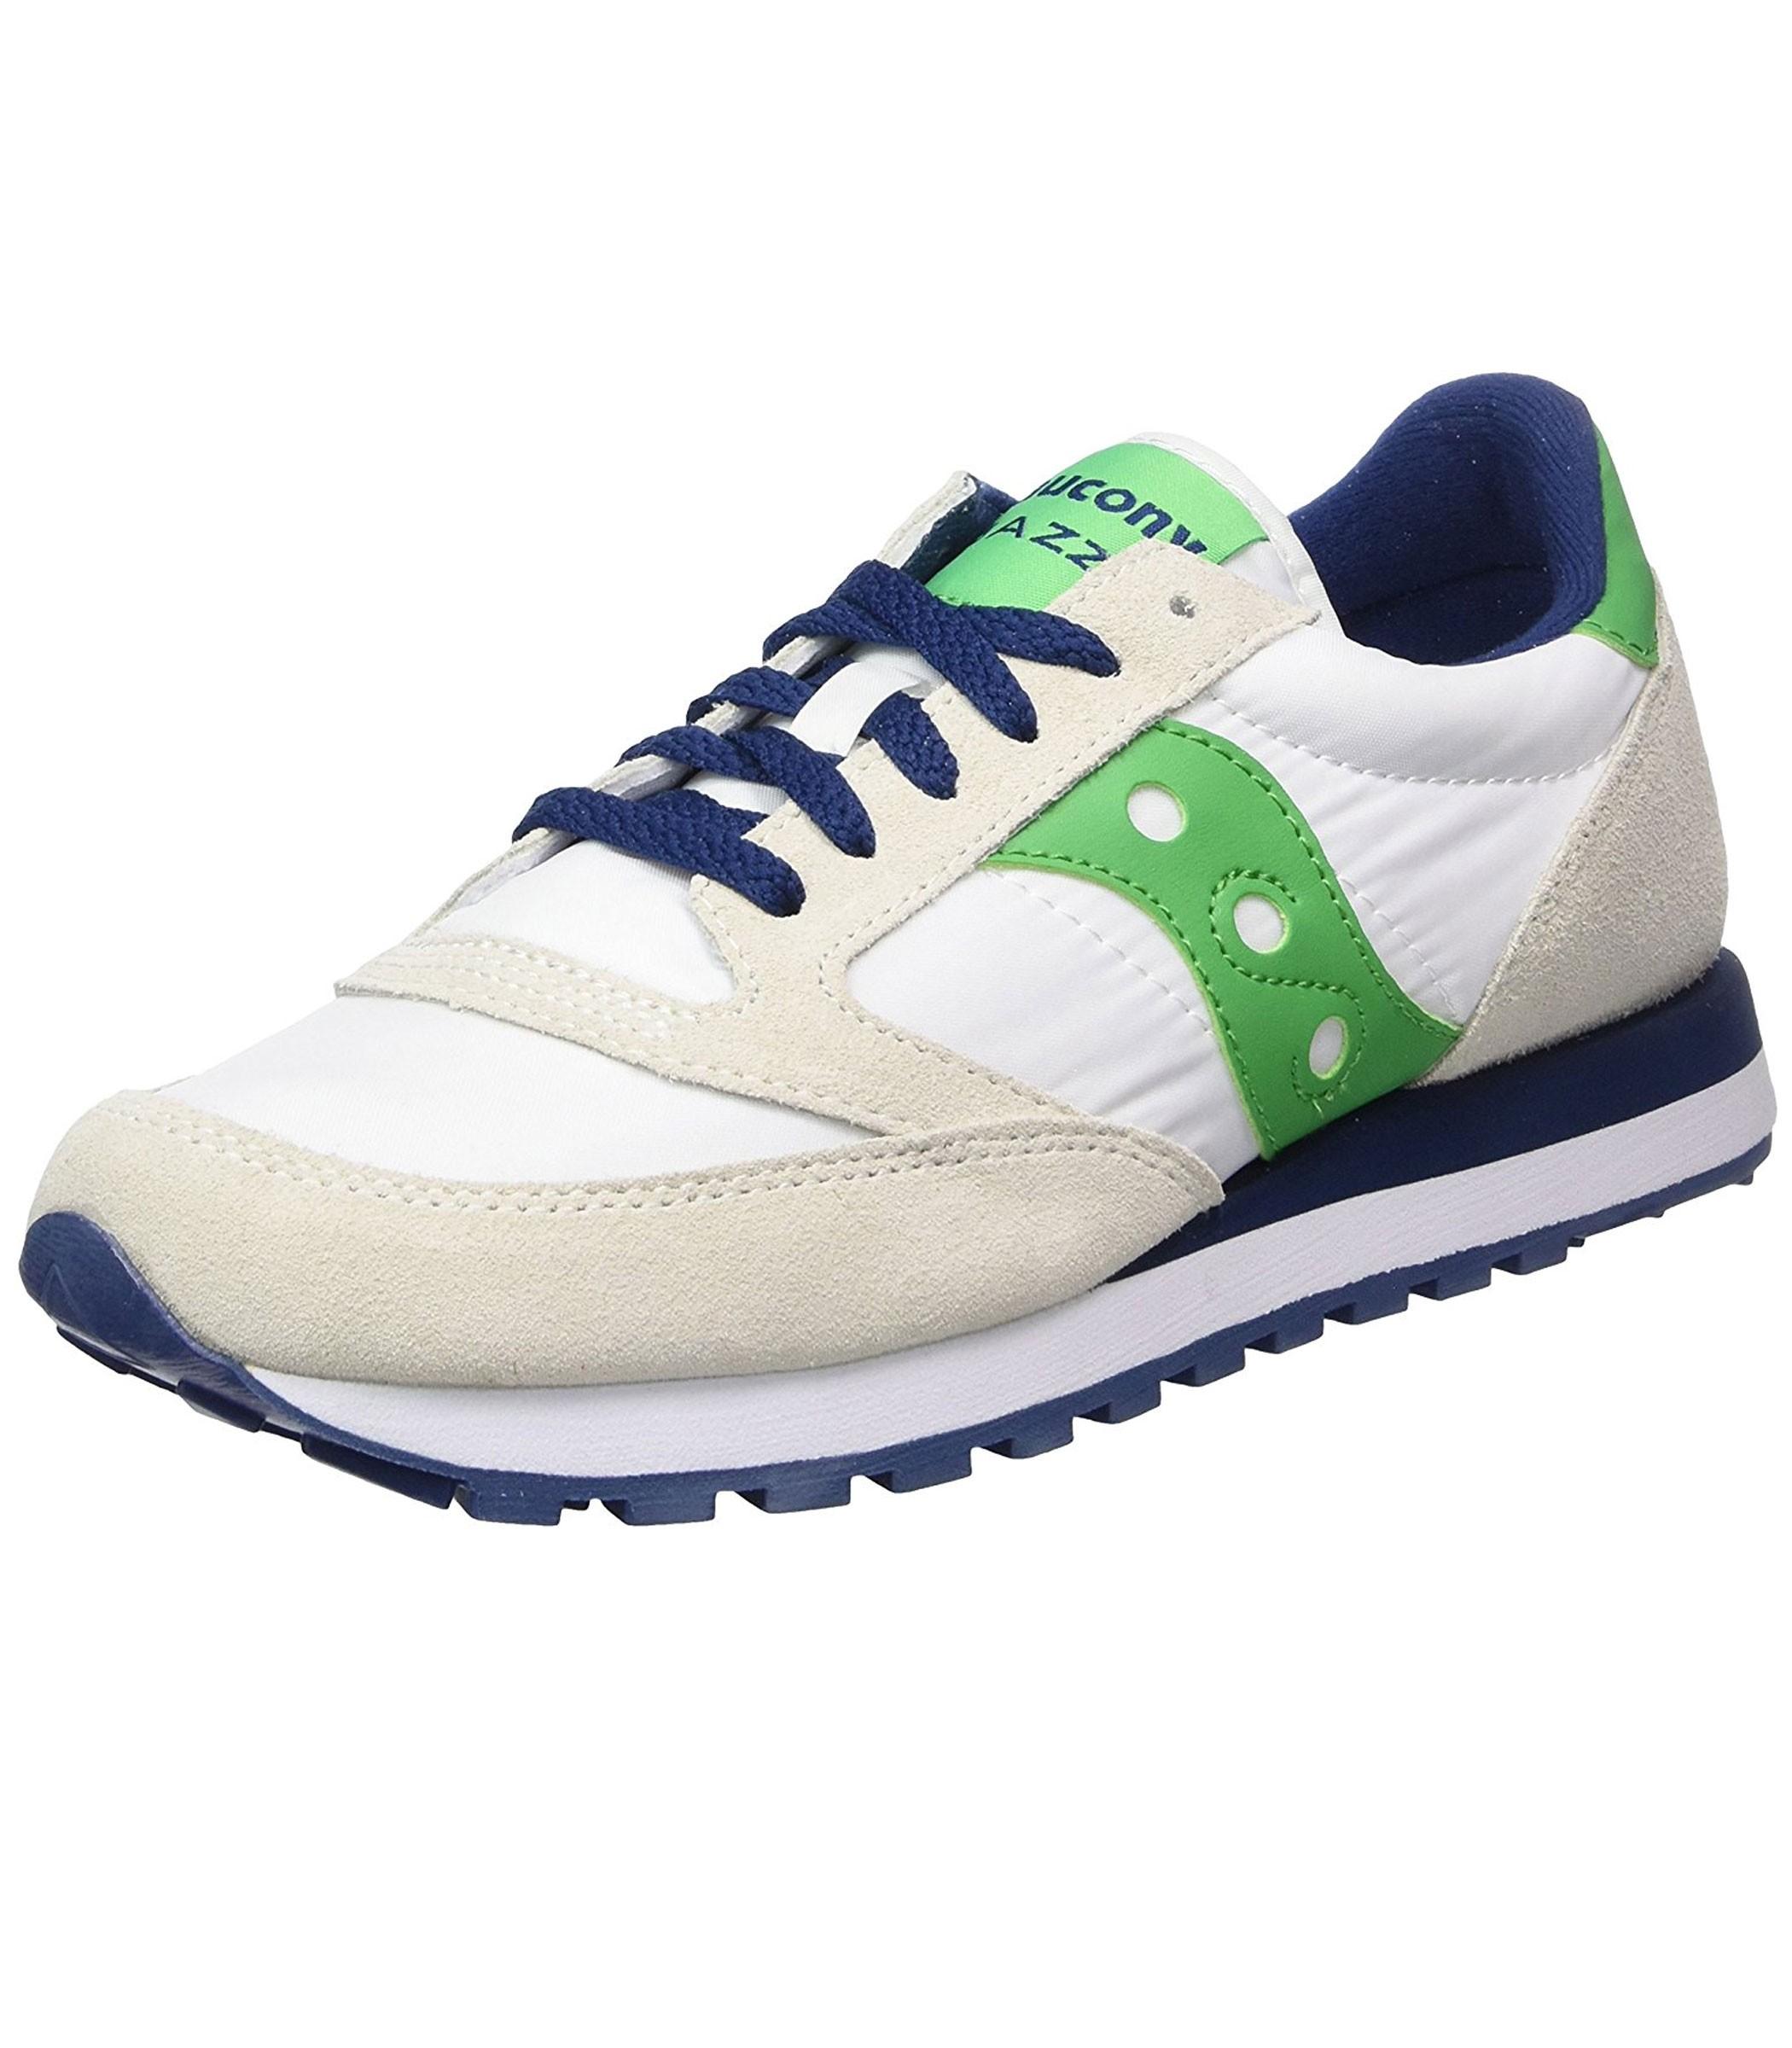 f5f2ebe239c5 scarpe-running-saucony-jazz-original-uomo-rif-s2044-448.jpg